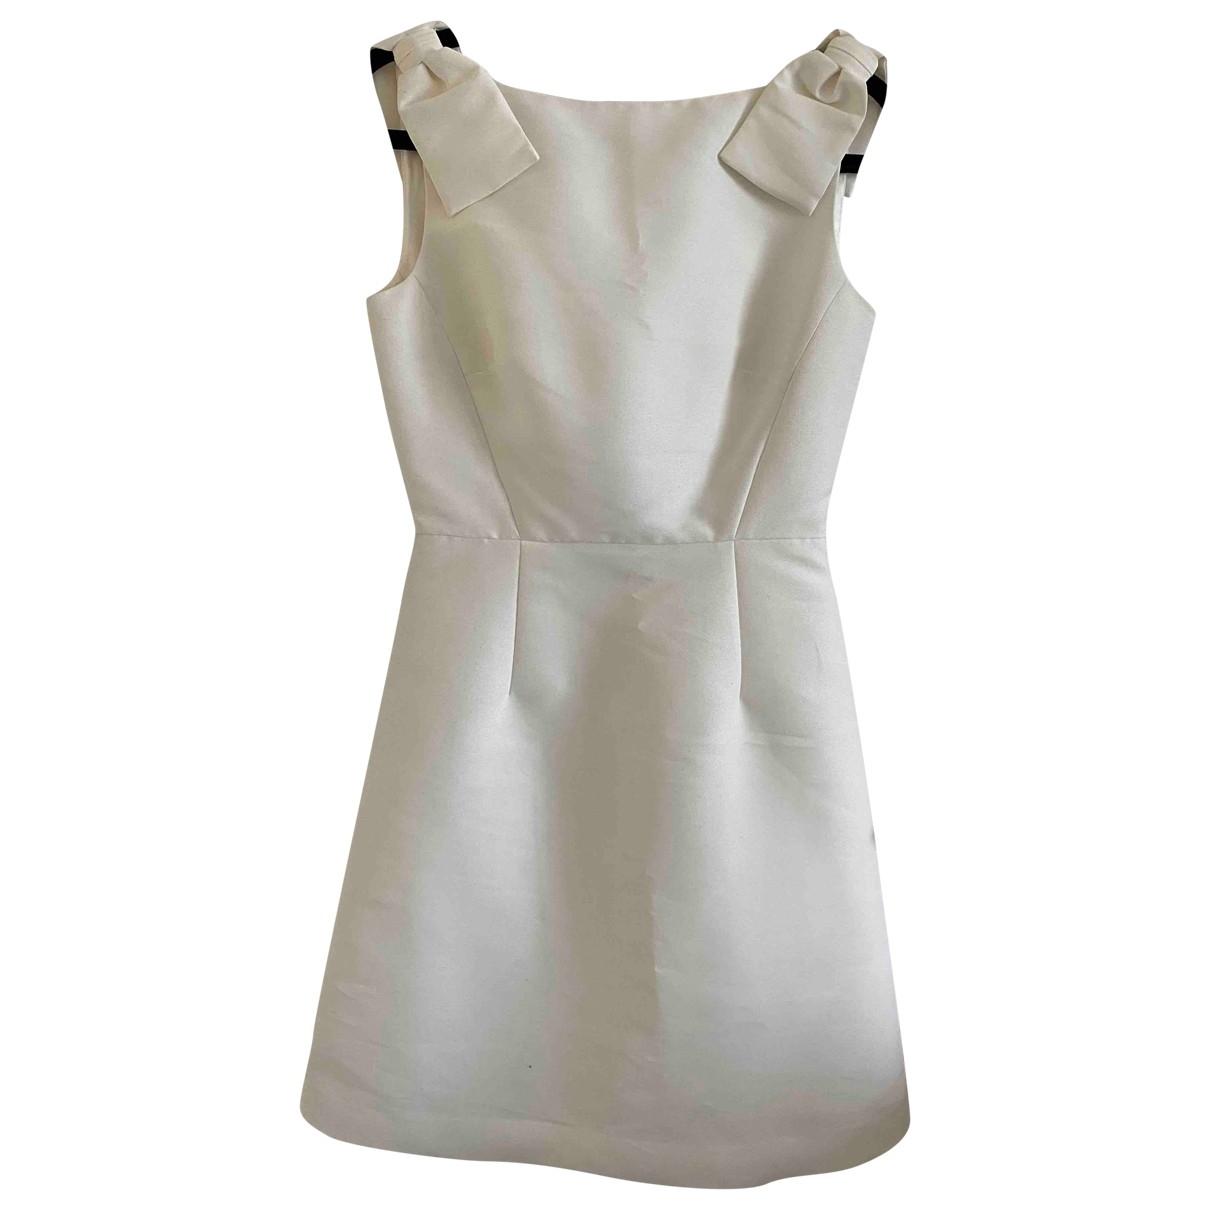 Kate Spade \N dress for Women S International